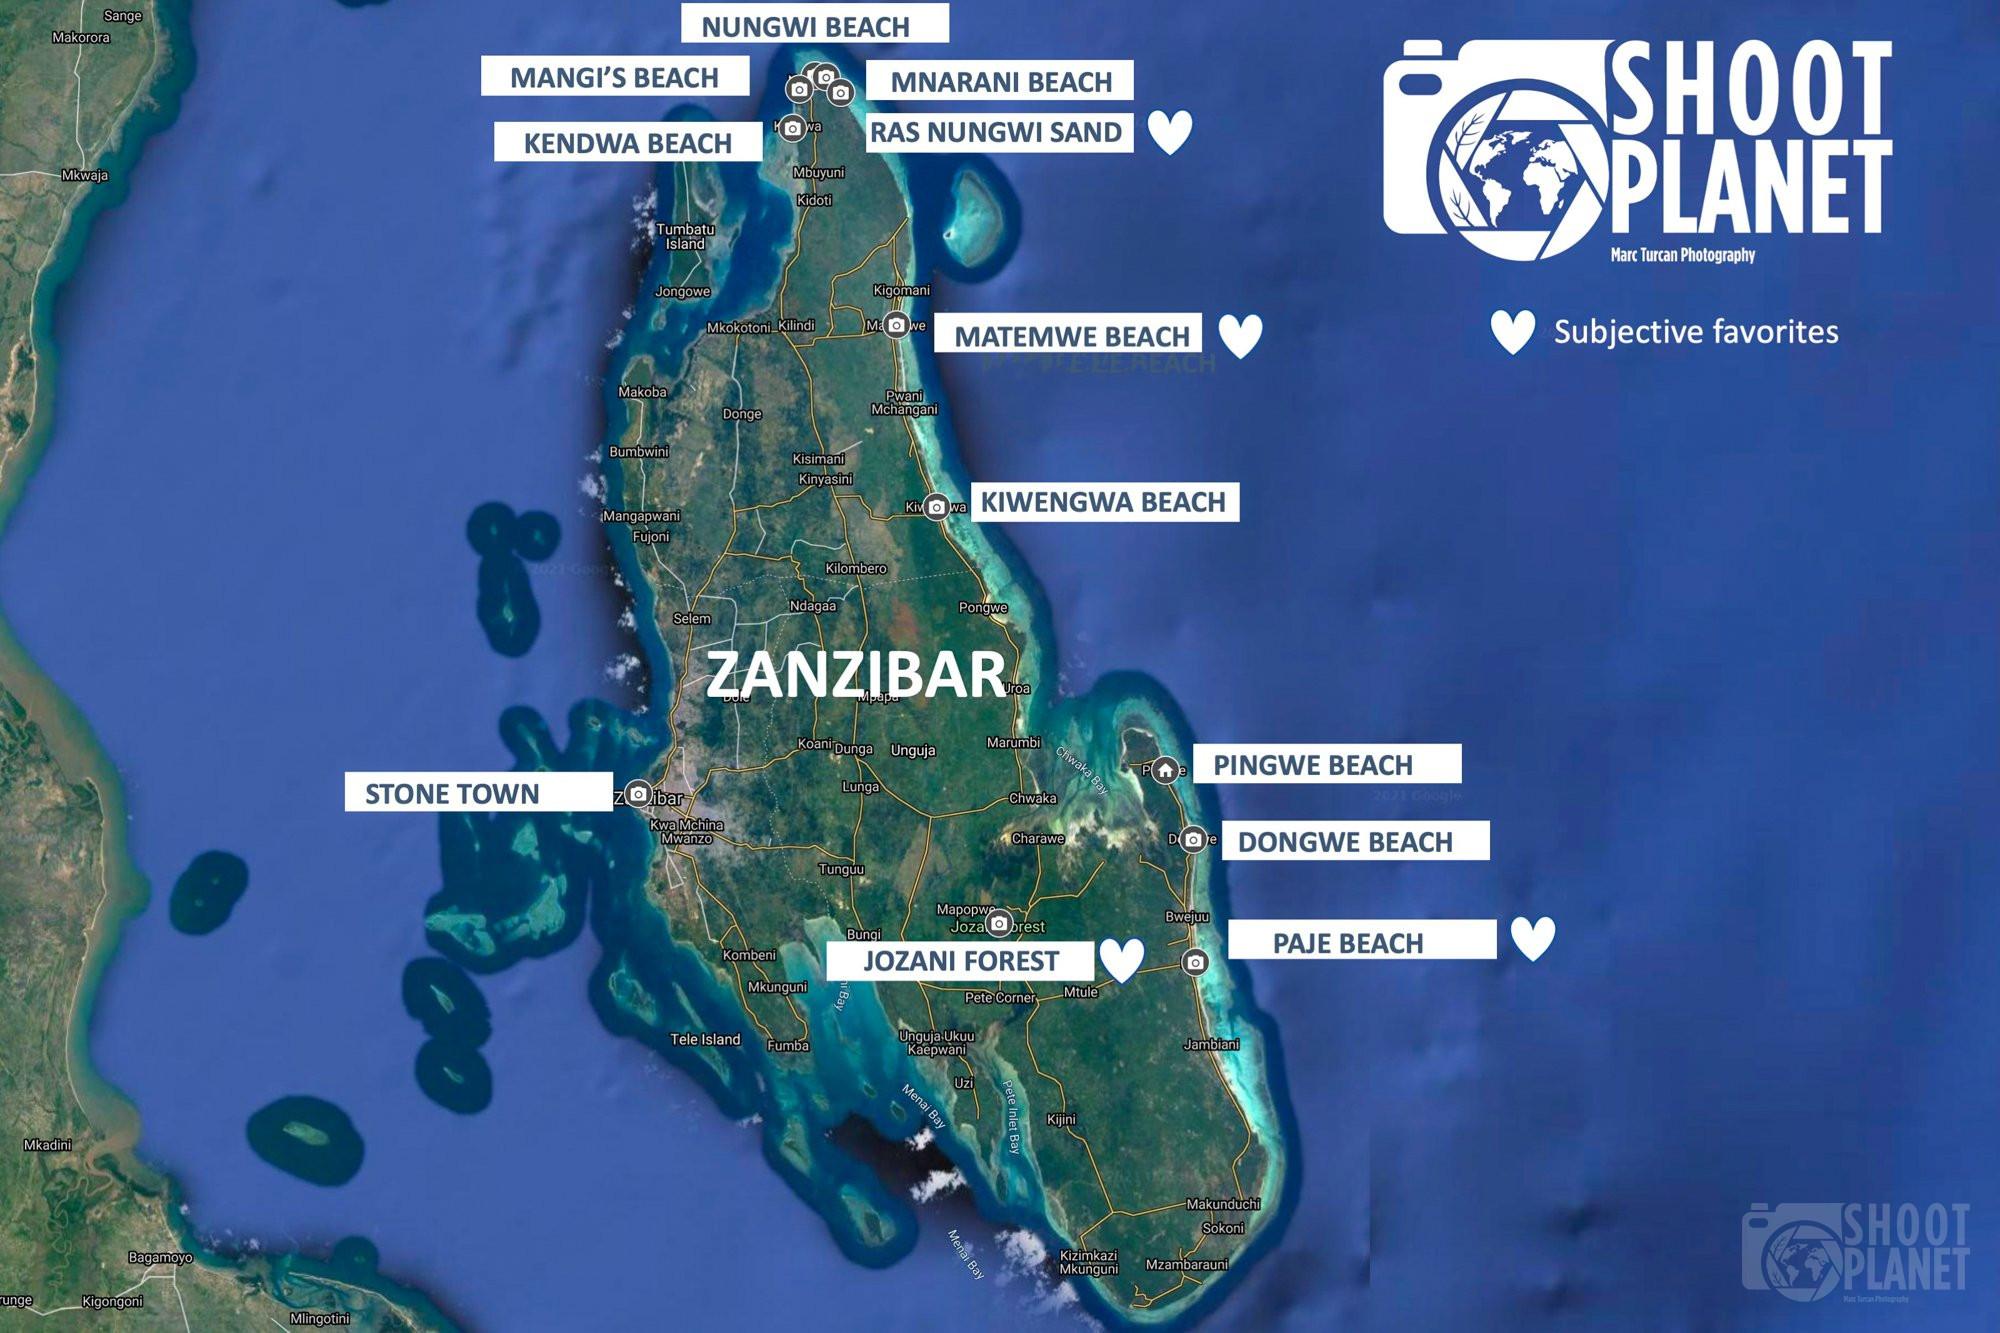 Zanzibar SHOOTPLANET best locations map, Tanzania